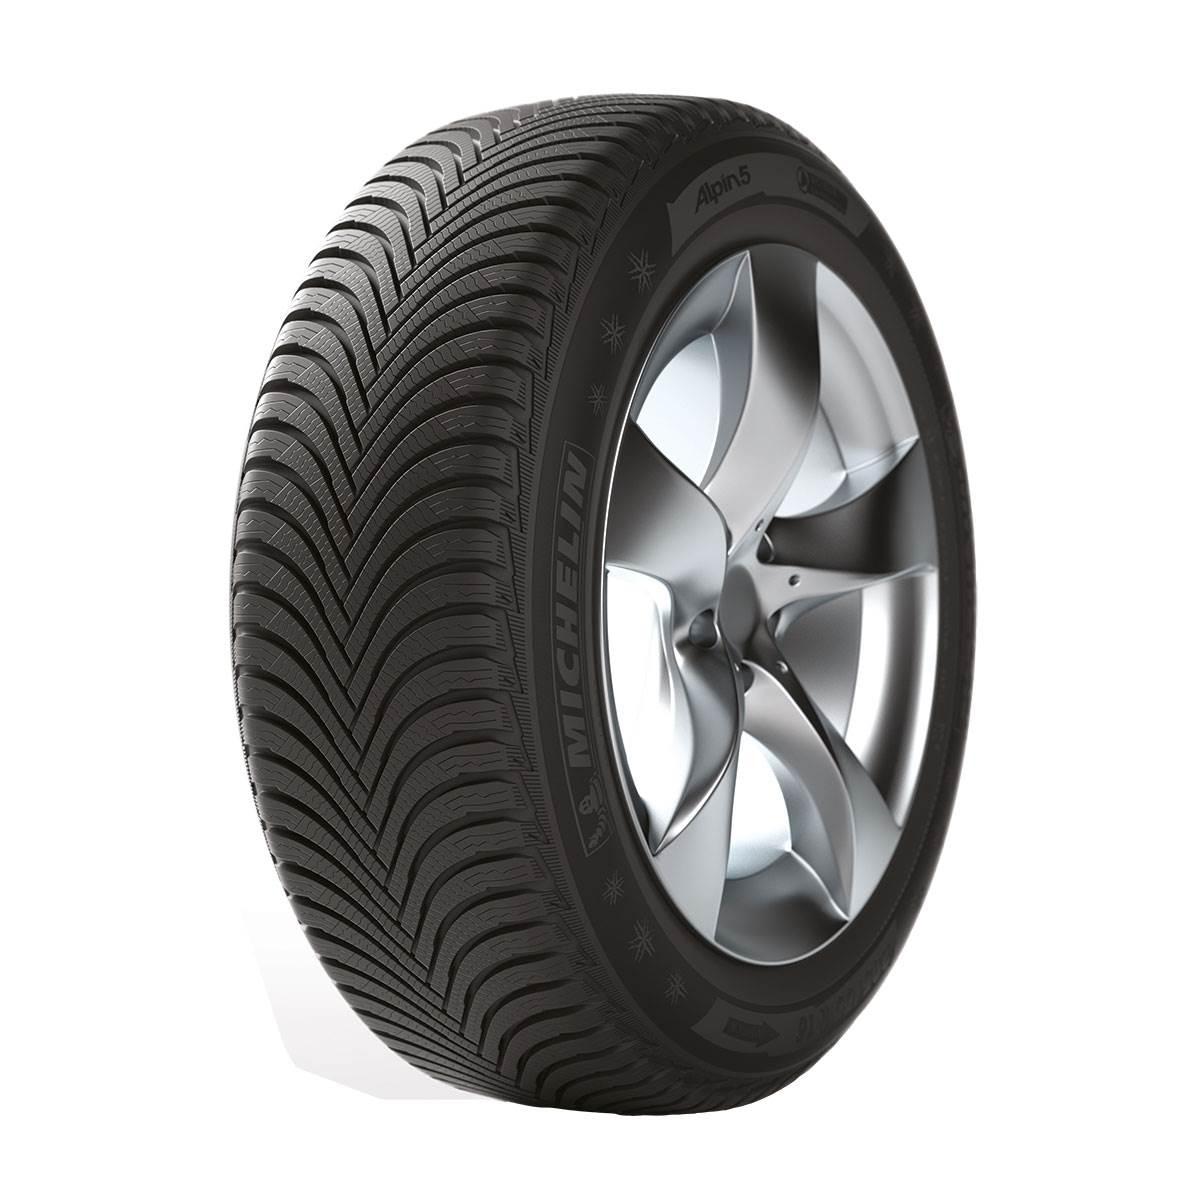 Pneu Hiver Michelin 195/60R16 89T Alpin A5